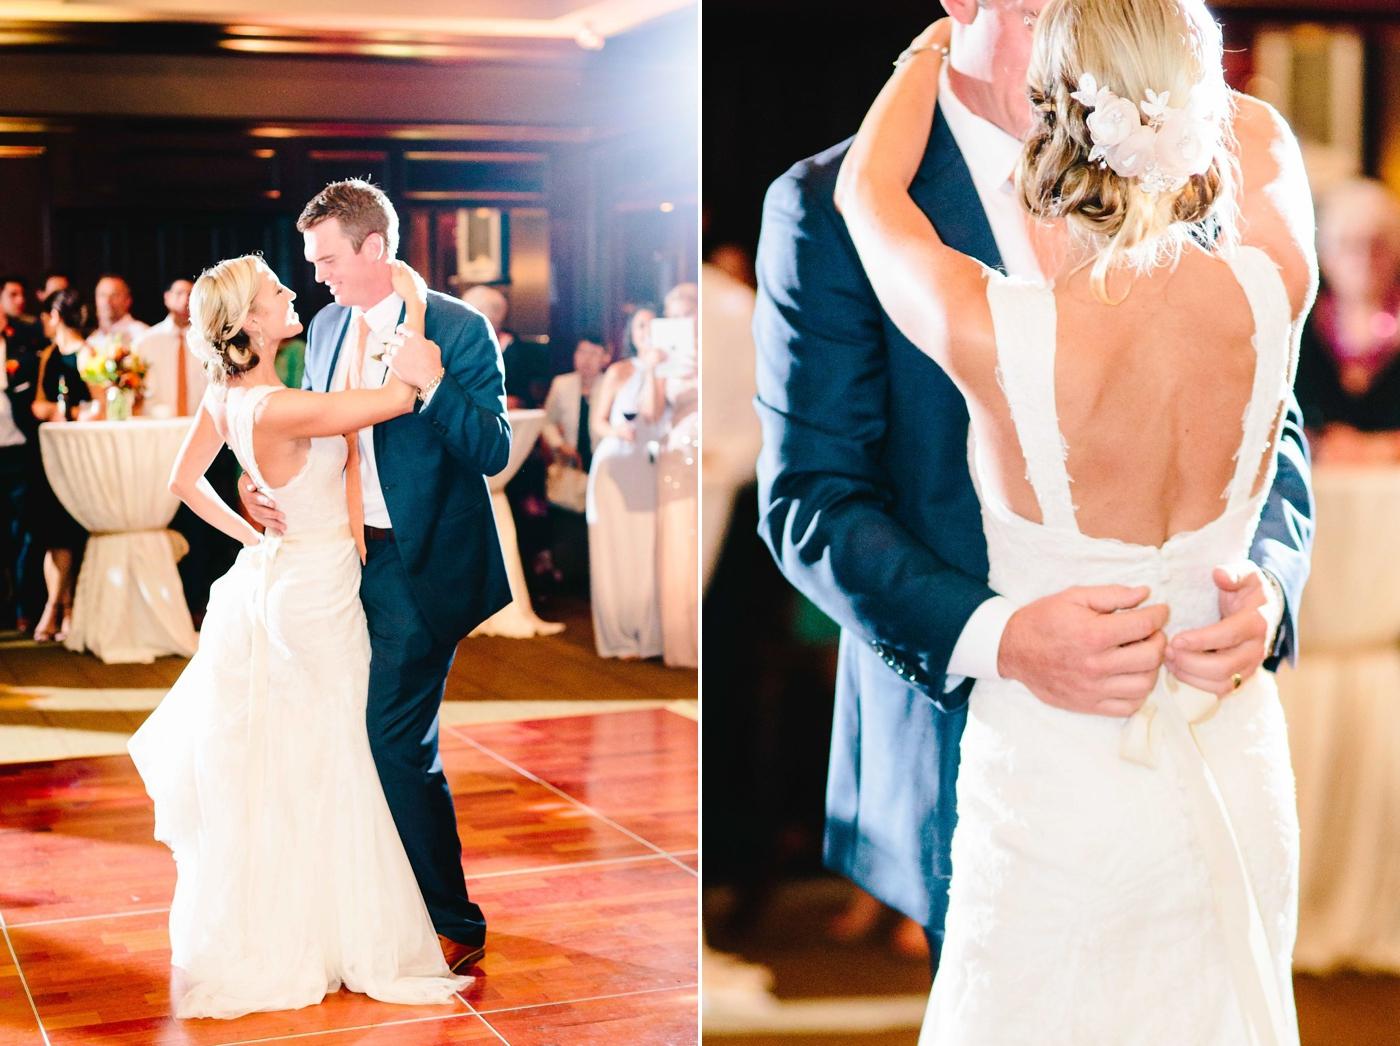 chicago-fine-art-wedding-photography-saylor42